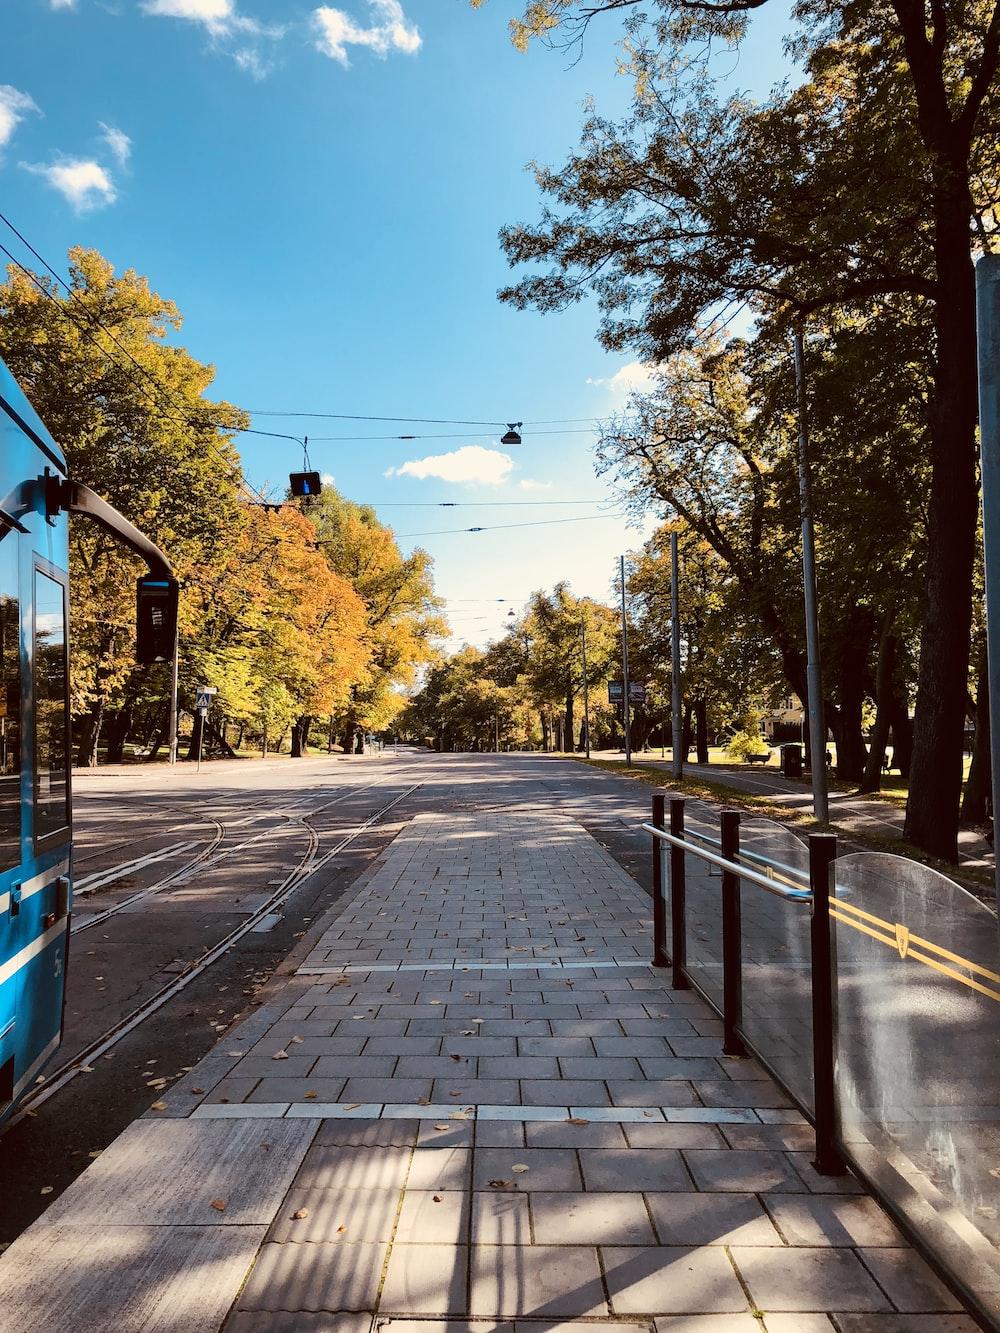 empty pavement